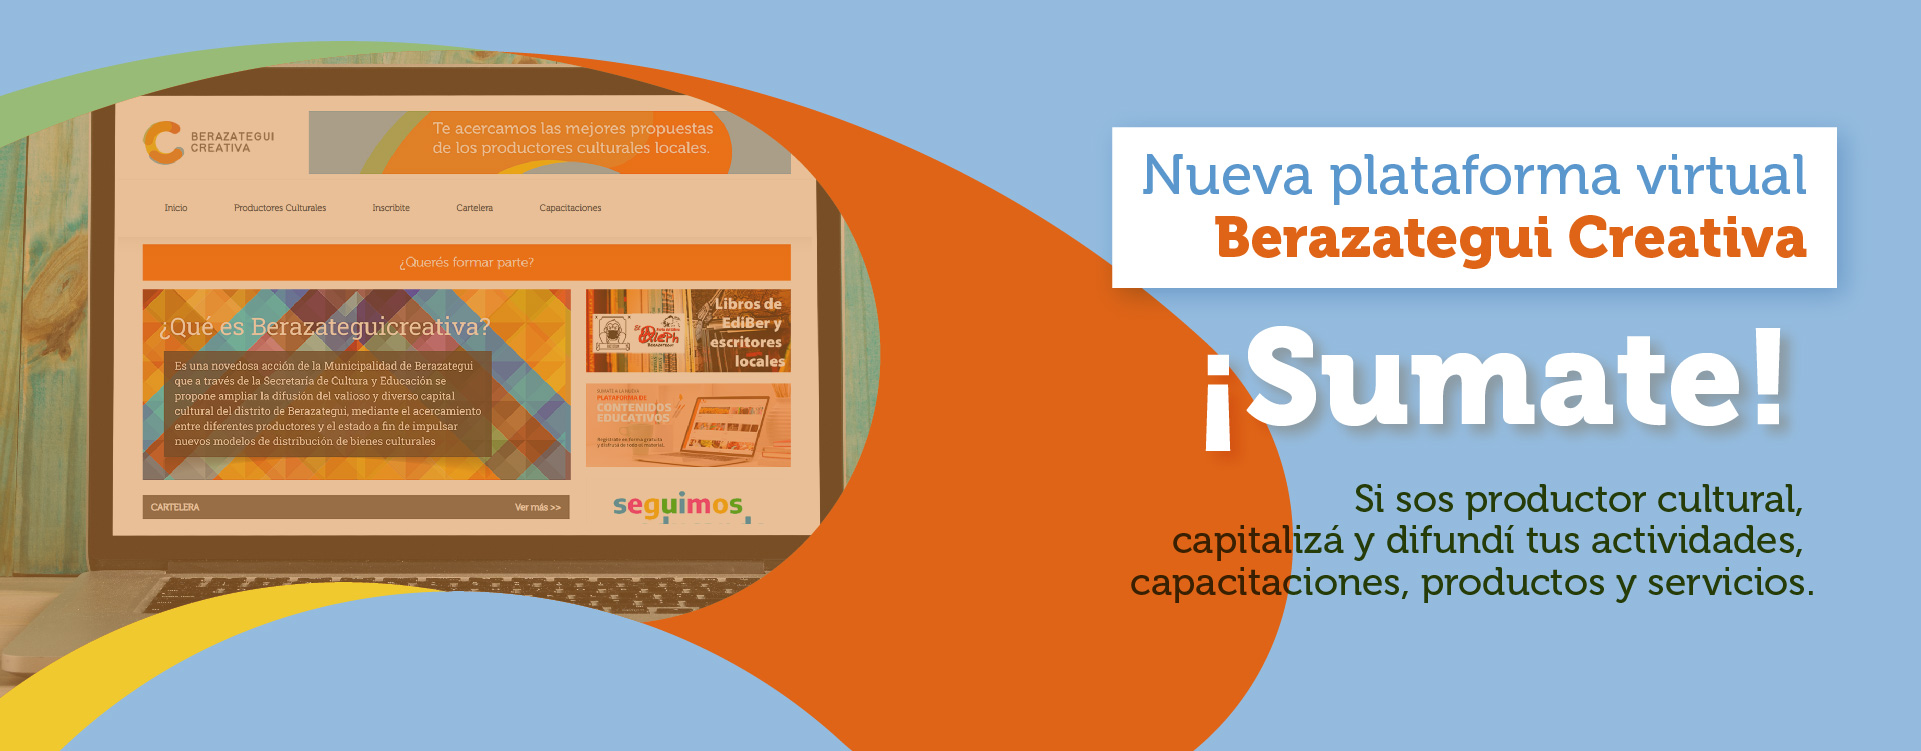 flyer-berazategui-creativa-convocatoria_Slider